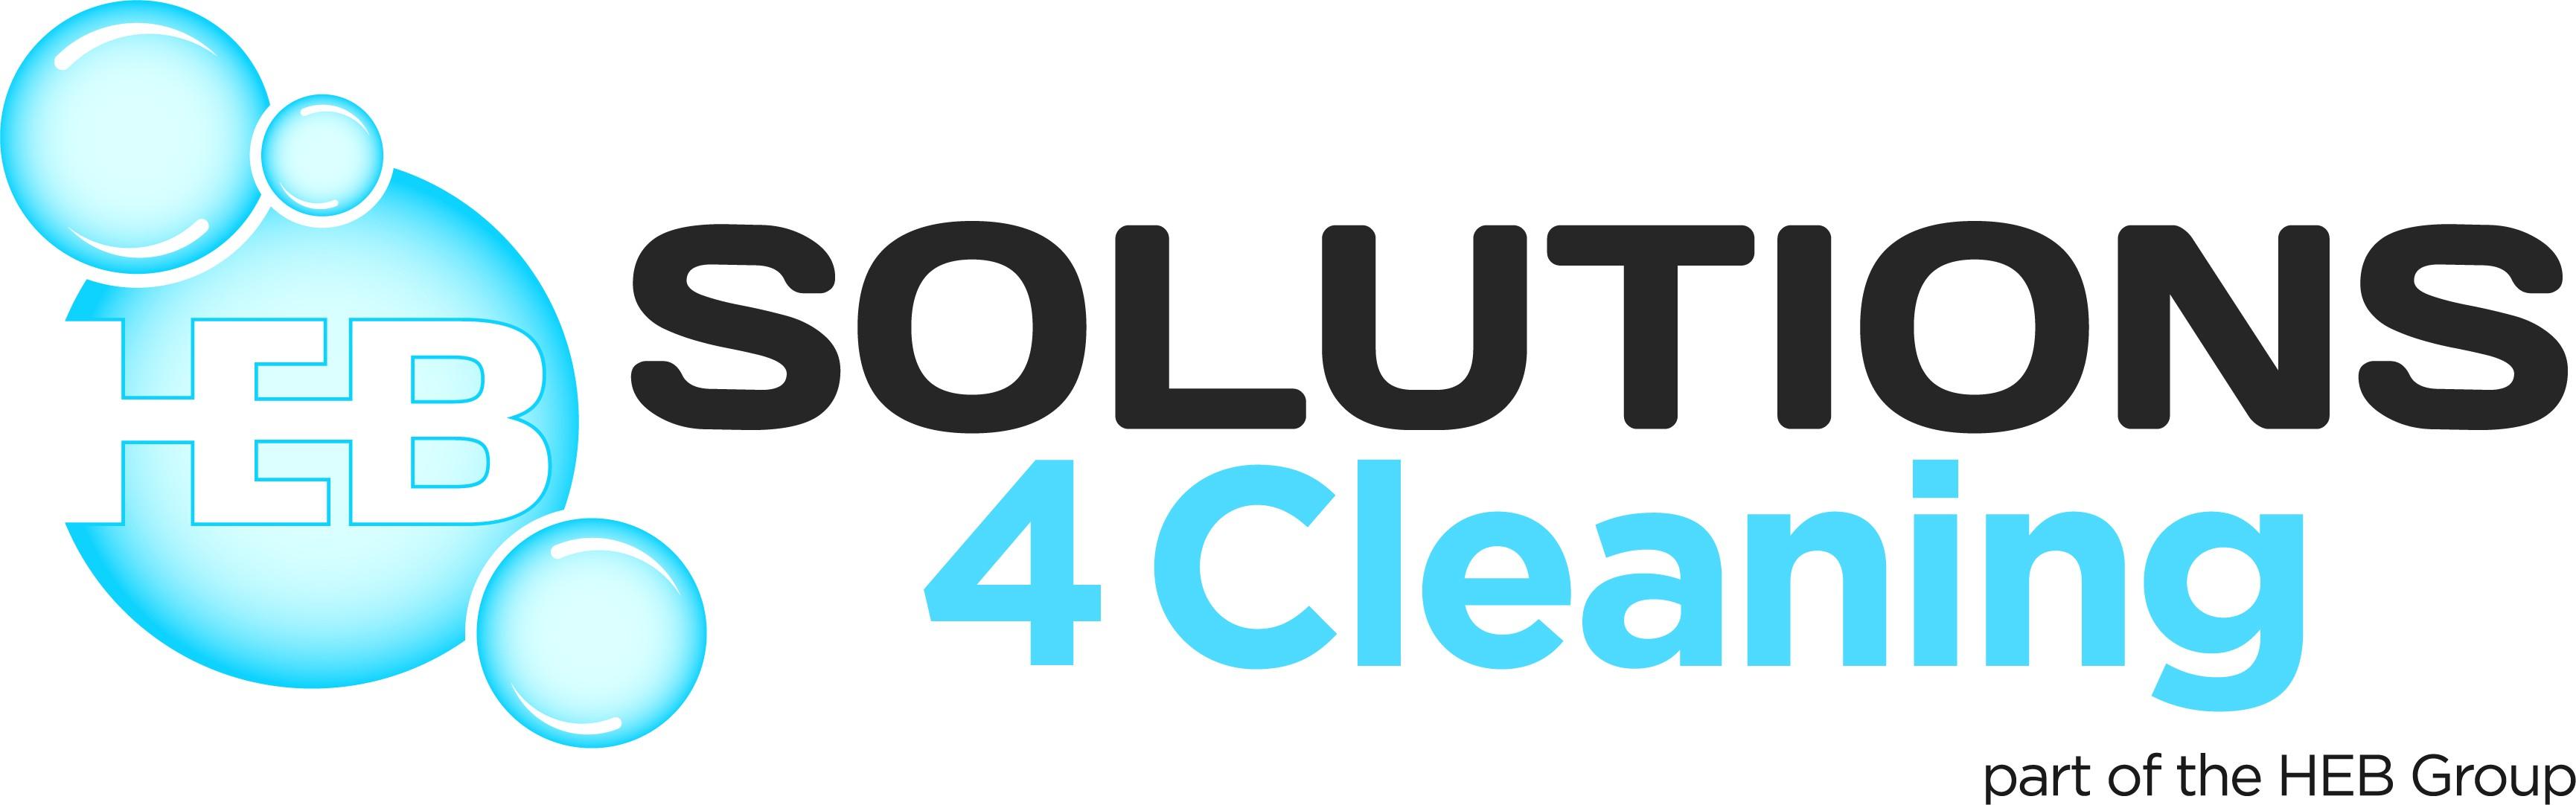 Solutions 4 Cleaning Ltd Linkedin